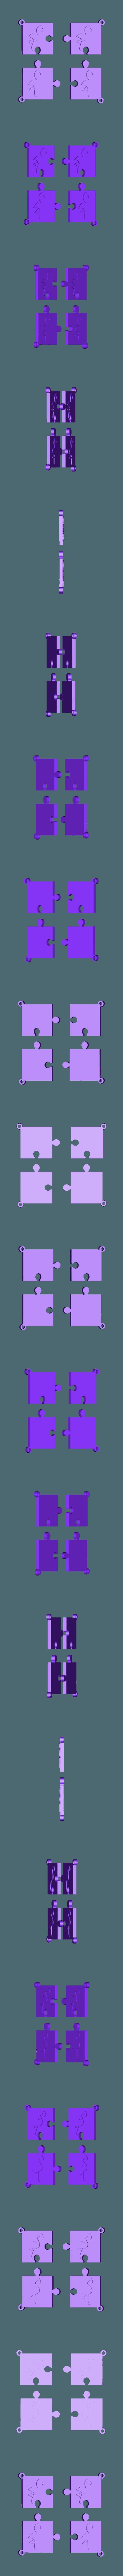 puzzle flamant rose.stl Download STL file puzzle key ring • 3D printing design, catf3d